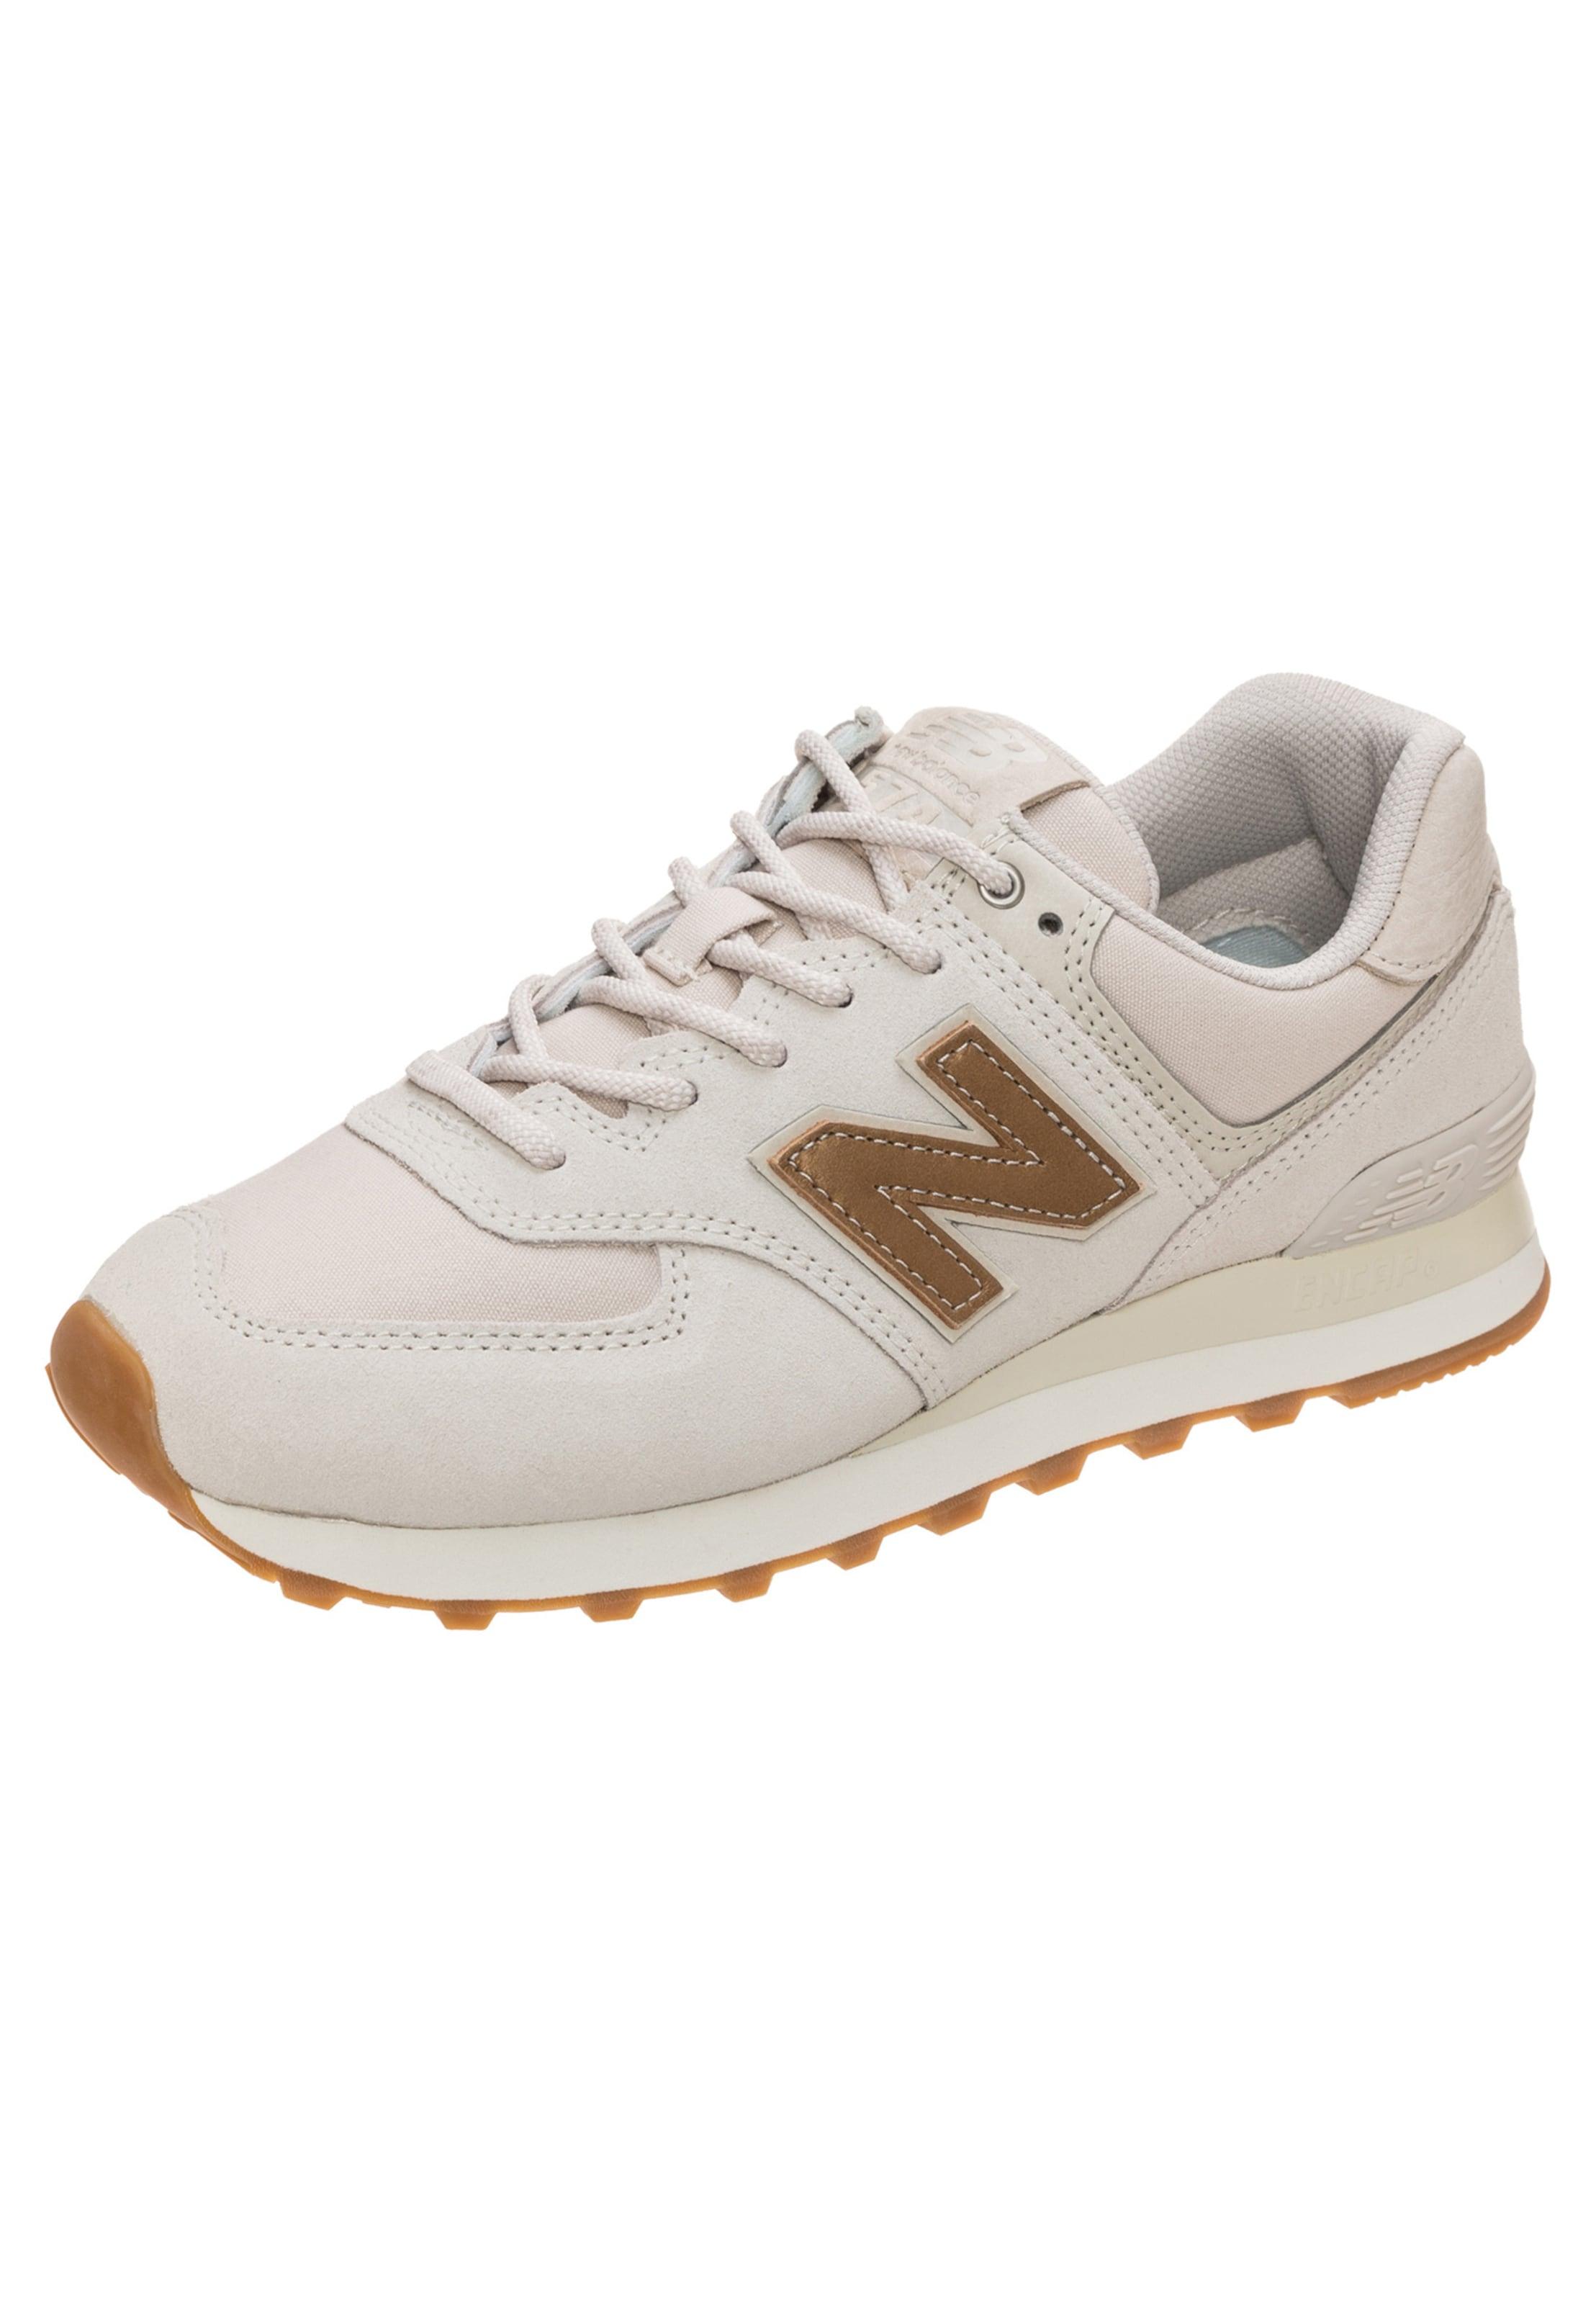 New Balance BeigeBraun In Sneaker cls b' 'wl574 EYIeW9H2D